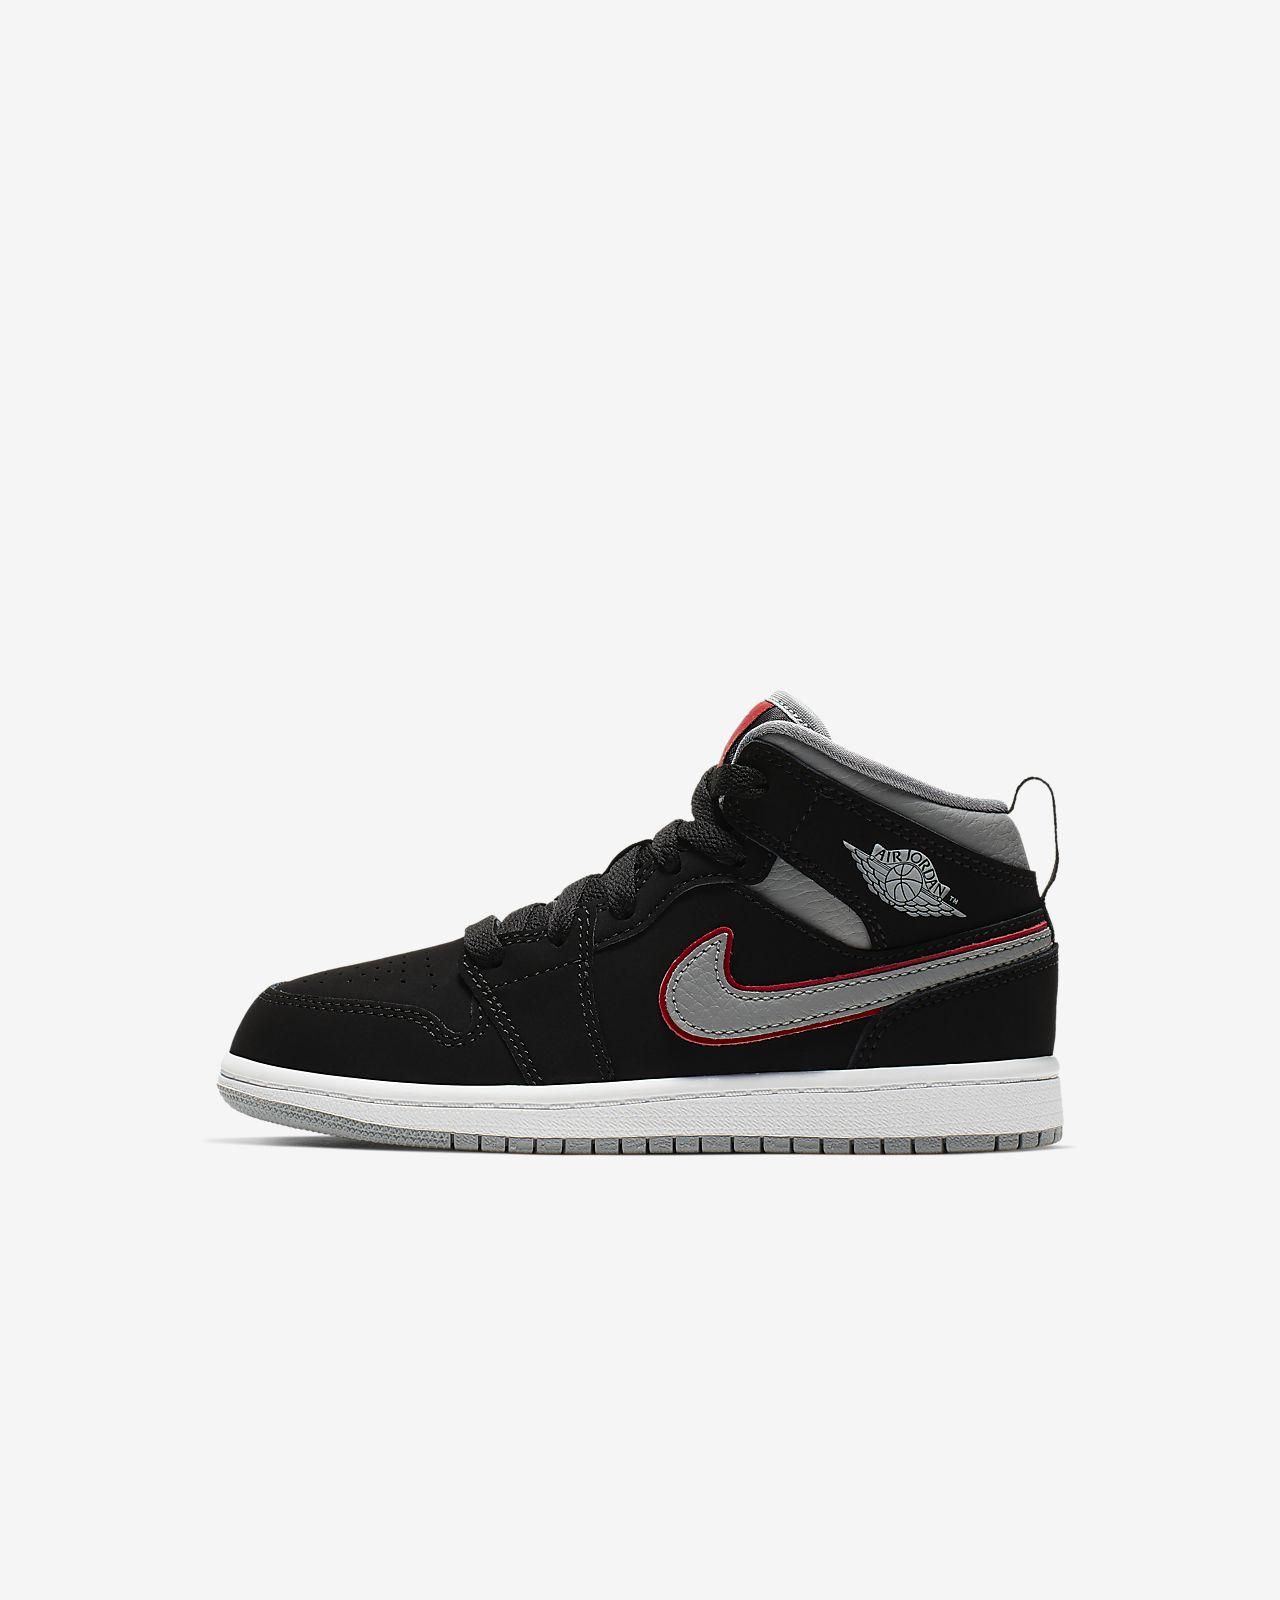 9603bc0ab51 Παπούτσι Air Jordan 1 Mid για μικρά παιδιά. Nike.com GR